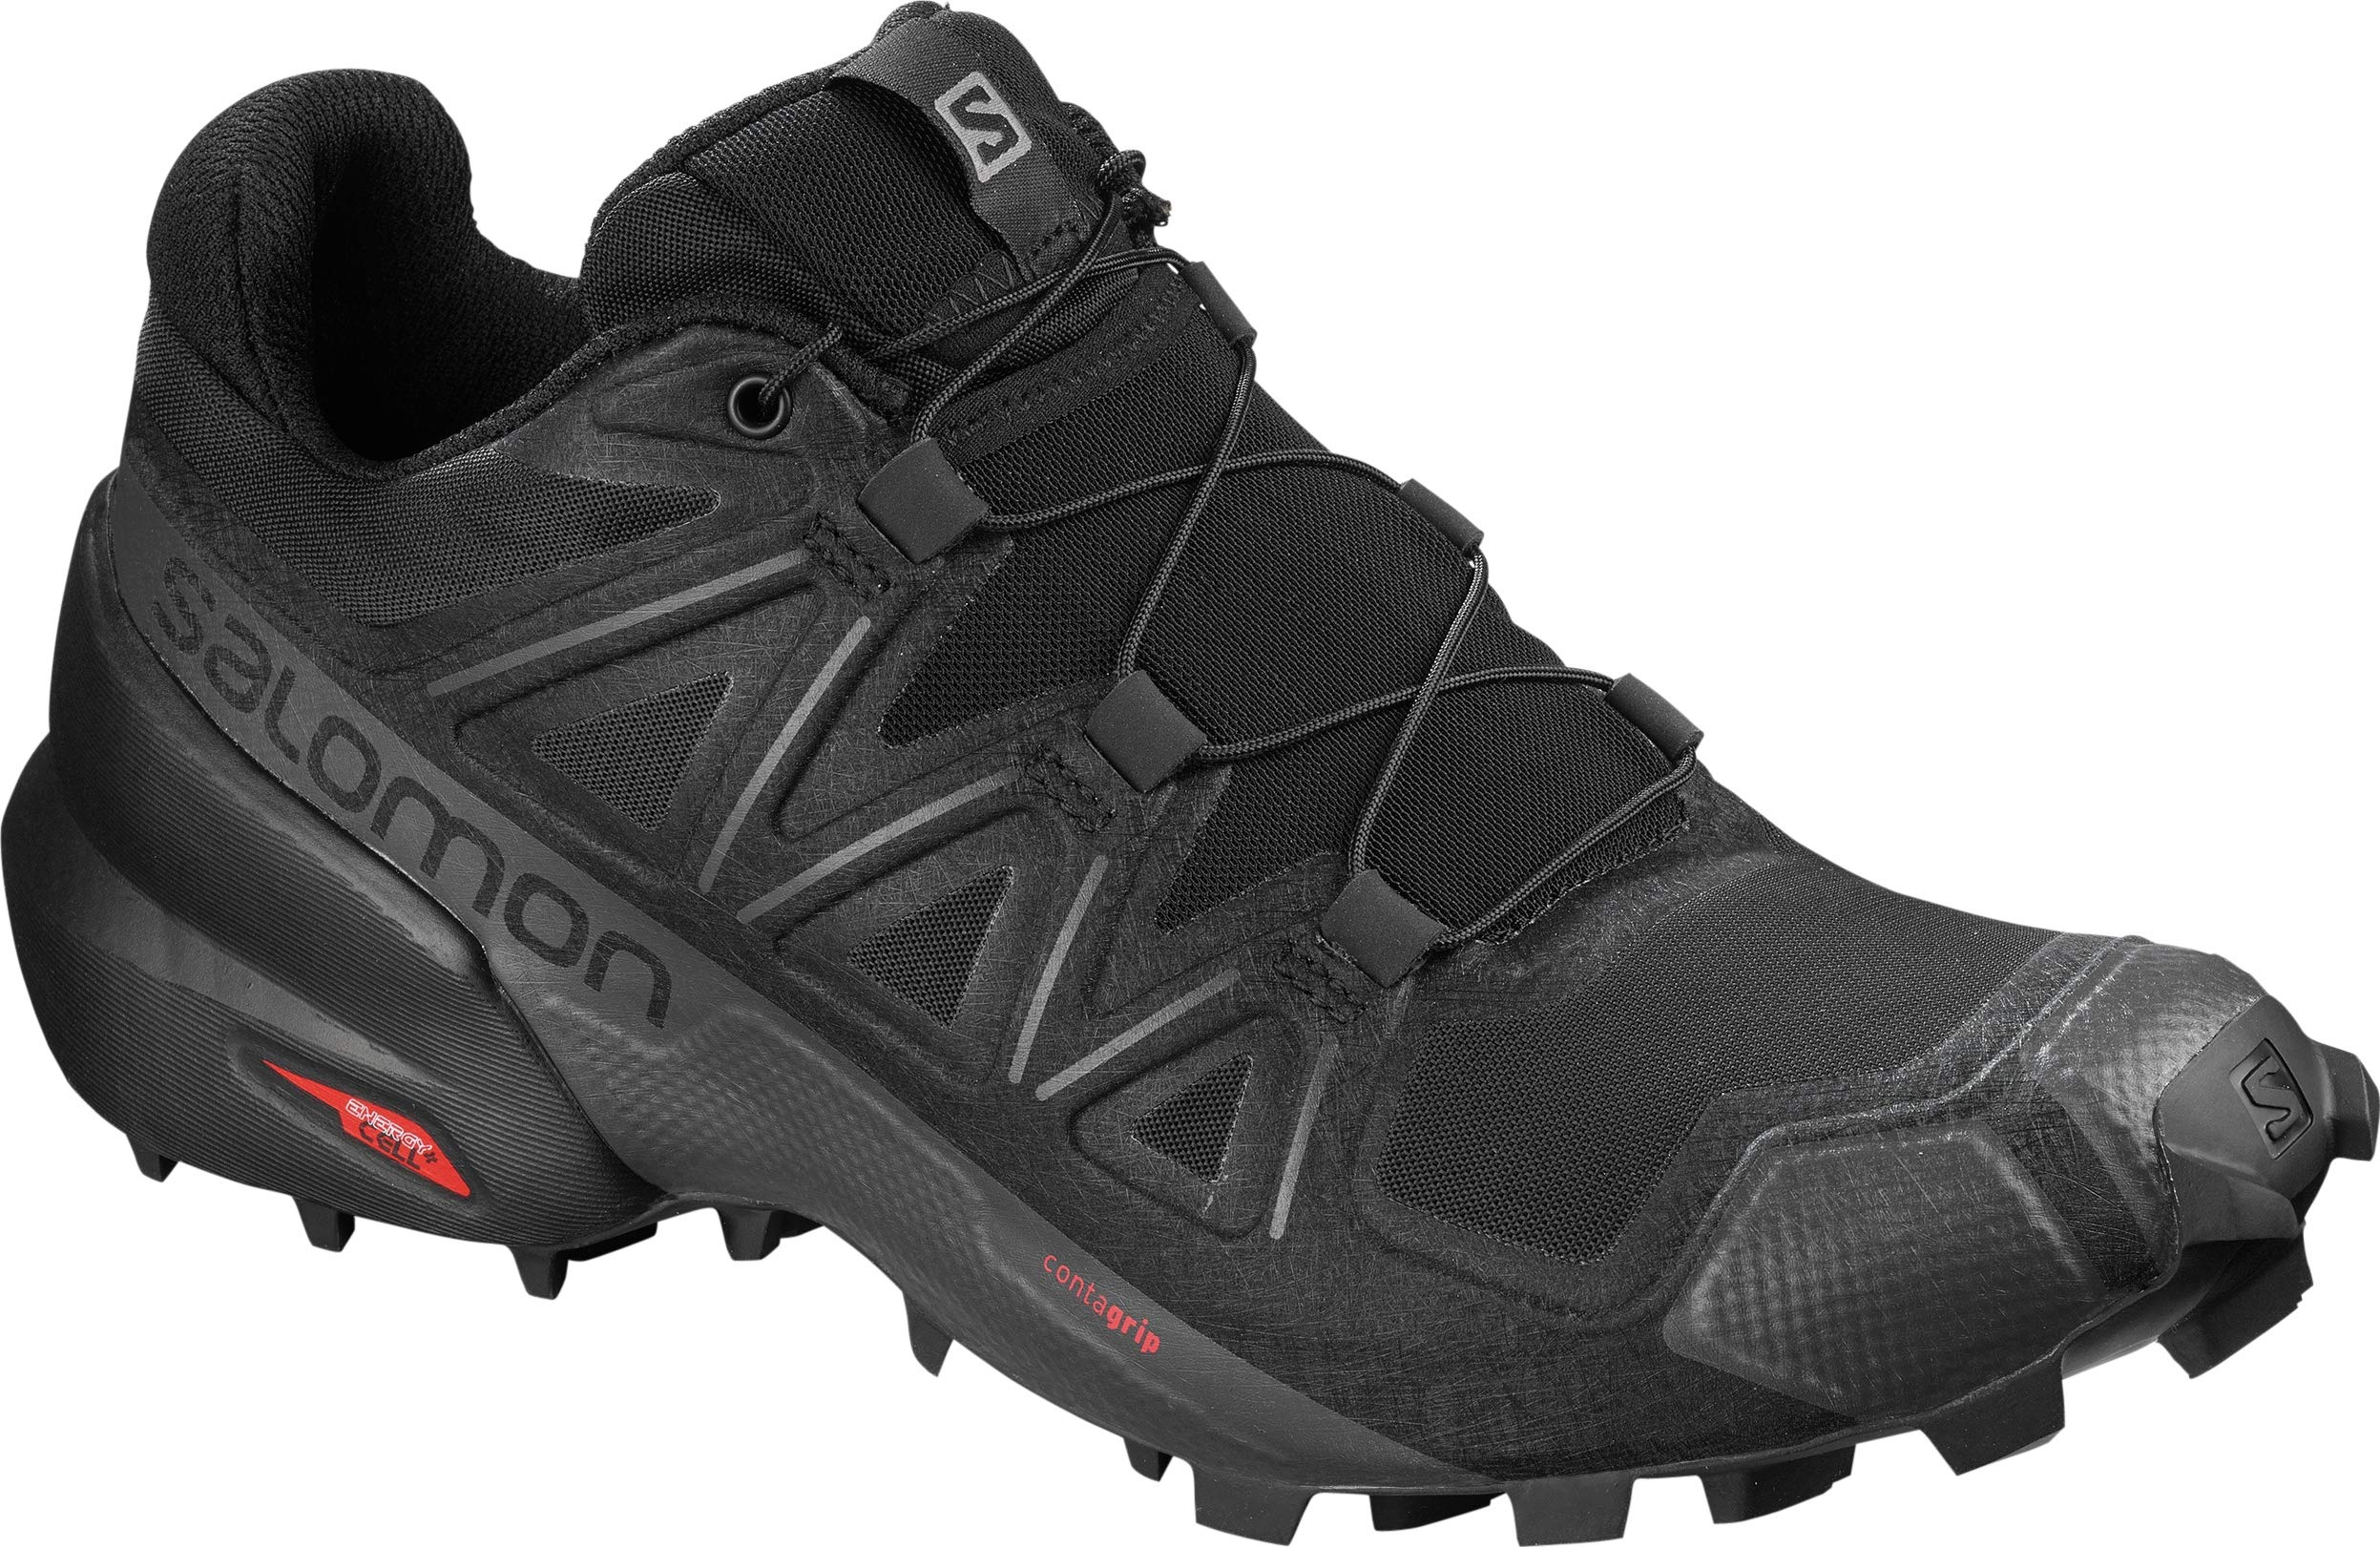 Salomon Women's Speedcross 5 Trail Running Shoes, Black/Black/PHANTOM, 10 by SALOMON